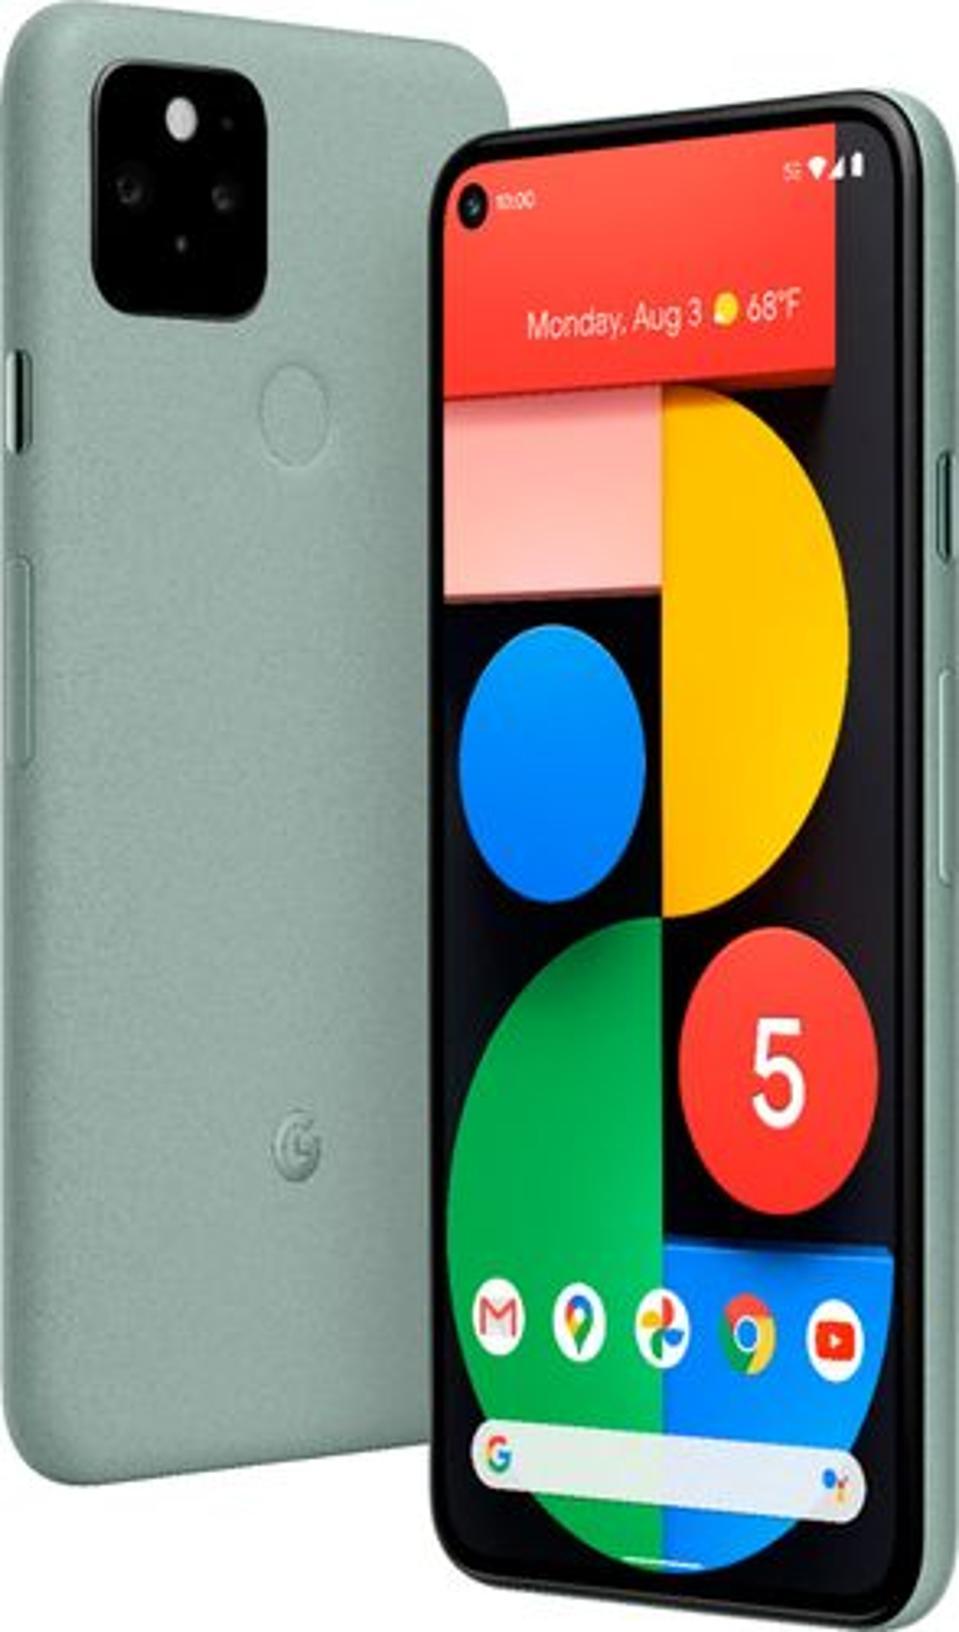 Google - Pixel 5 5G 128GB (Unlocked) - Sorta Sage